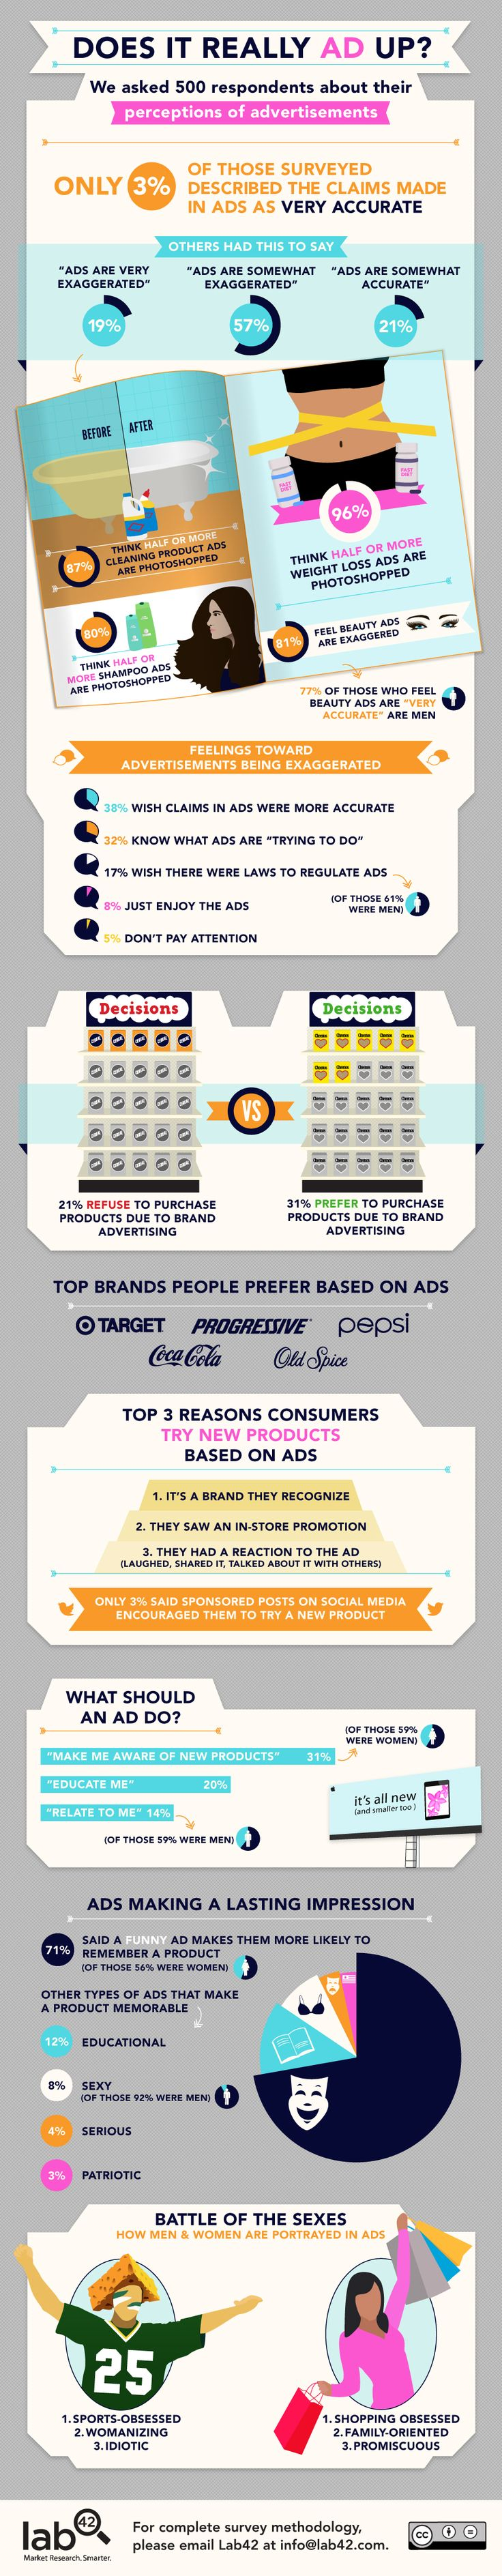 Lab42 Ad Perceptions Infographic